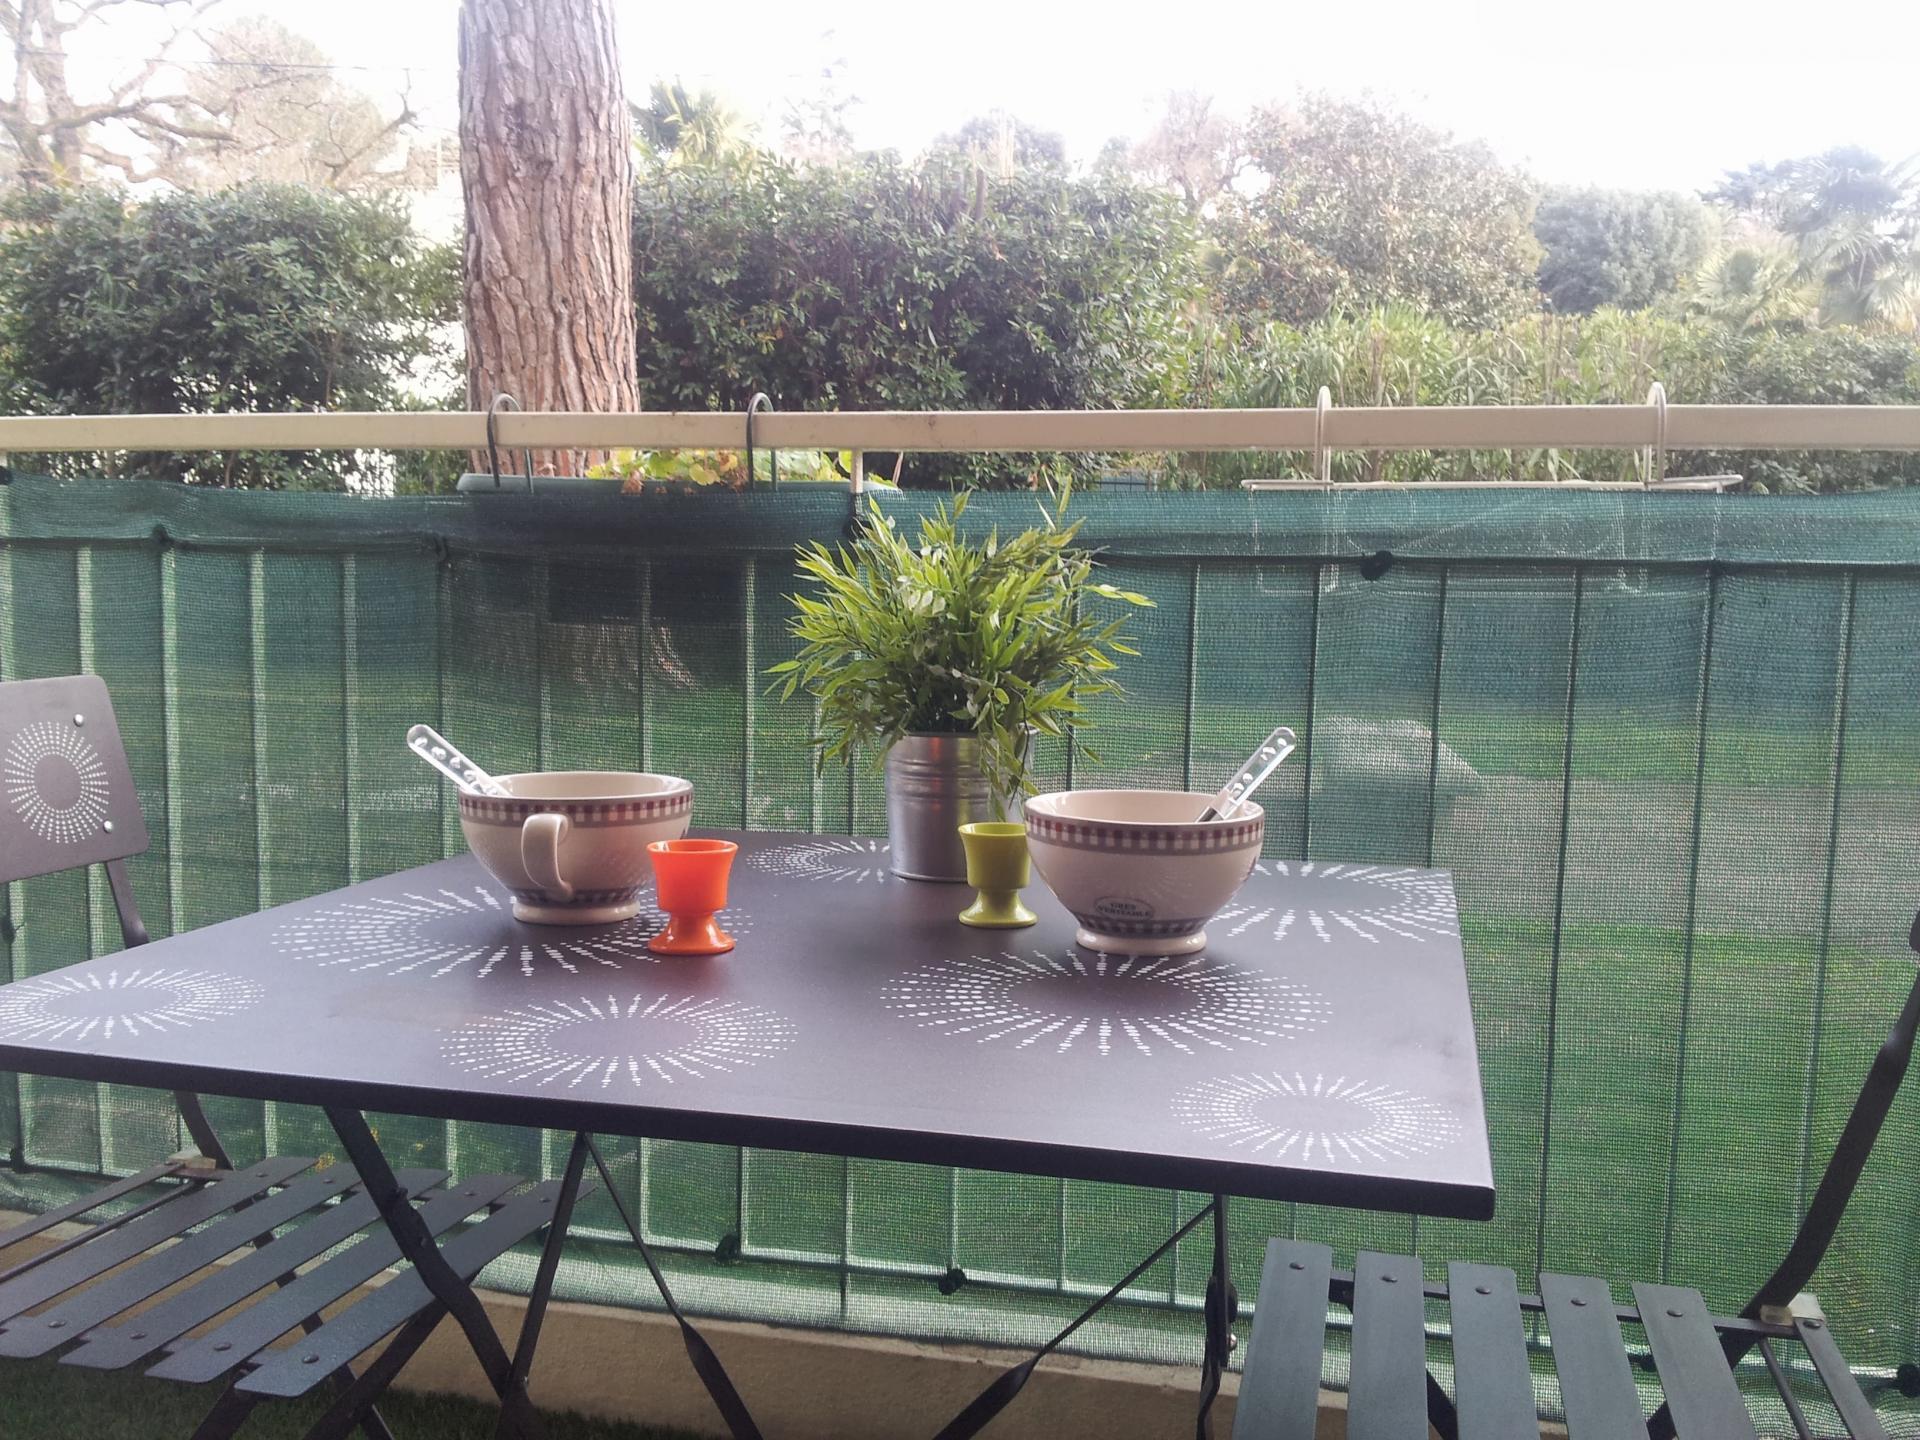 studio 4 personnes balcon wifi parking climatisation. Black Bedroom Furniture Sets. Home Design Ideas